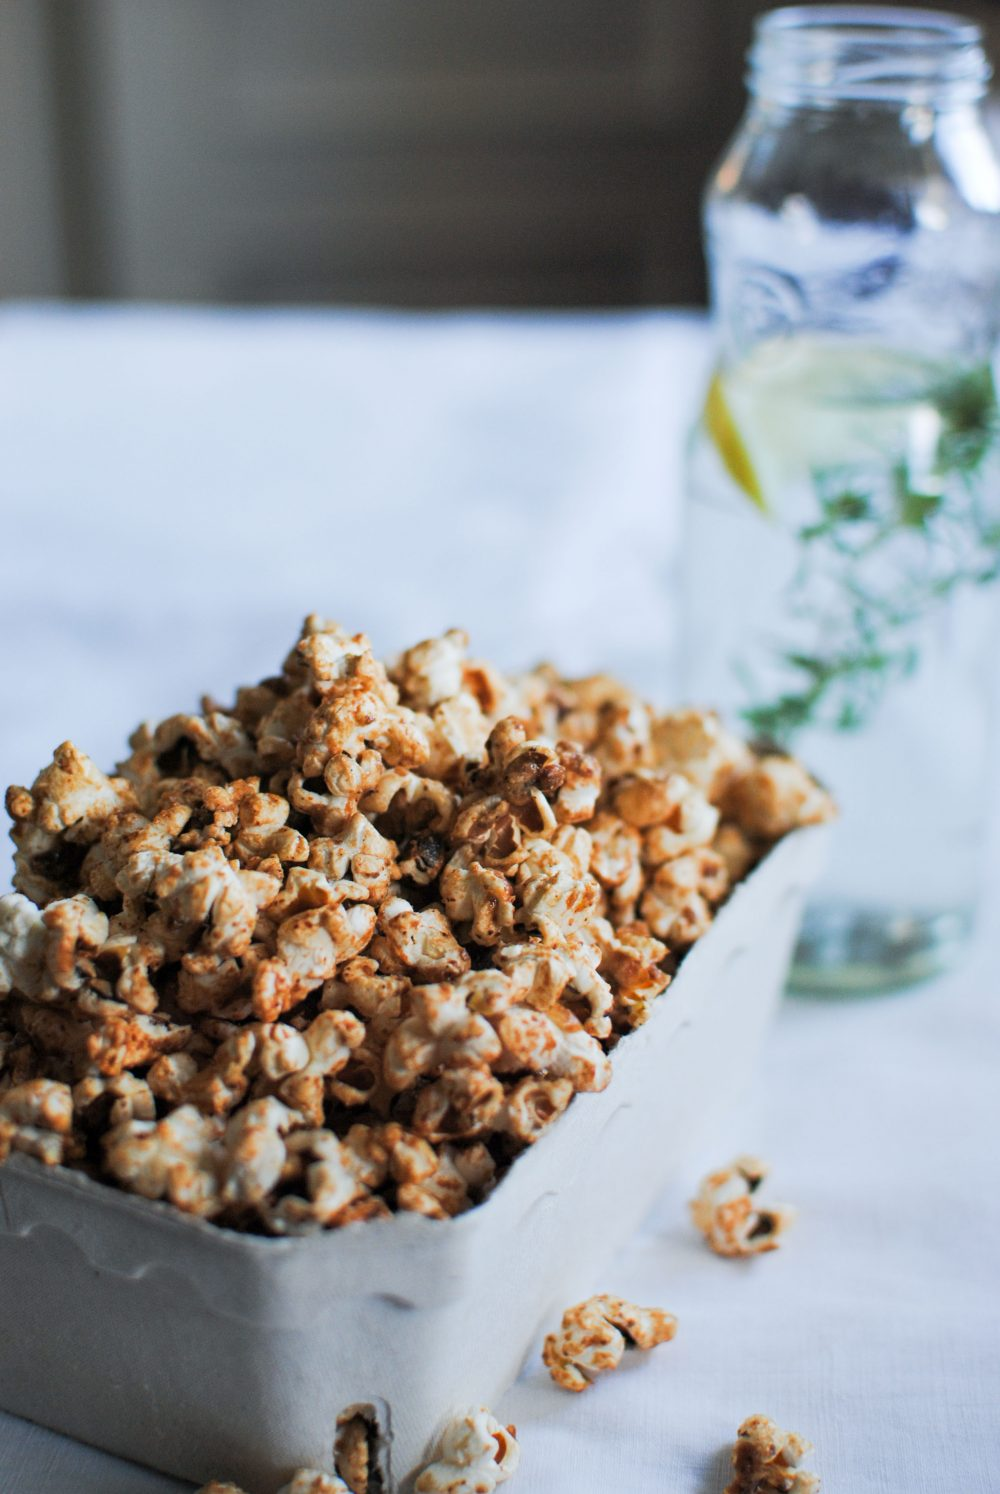 pipocas de caramelo salgado | please consider | joana limao